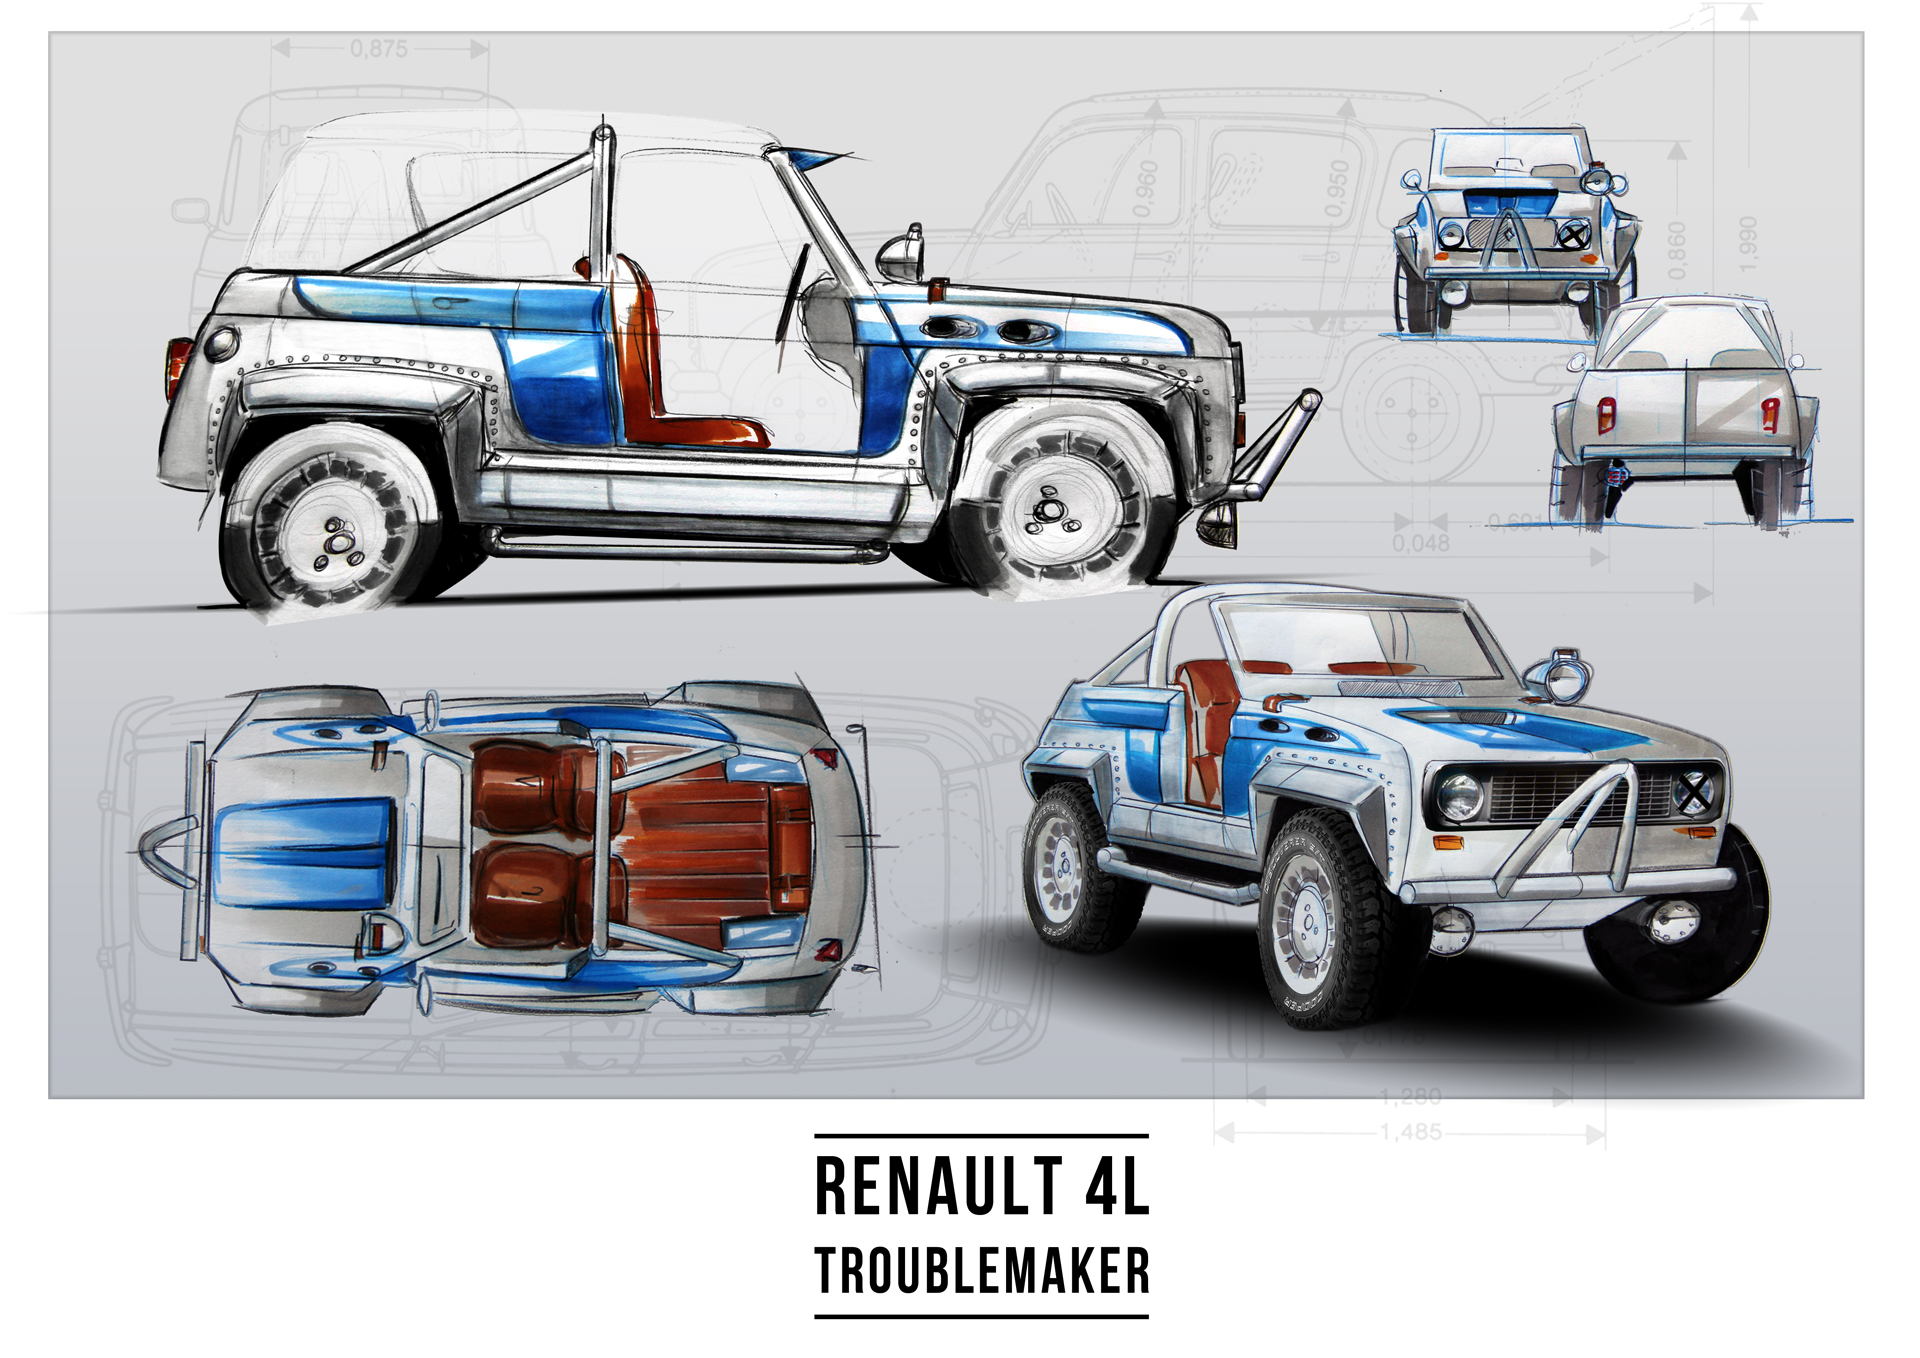 R4 Troublemaker